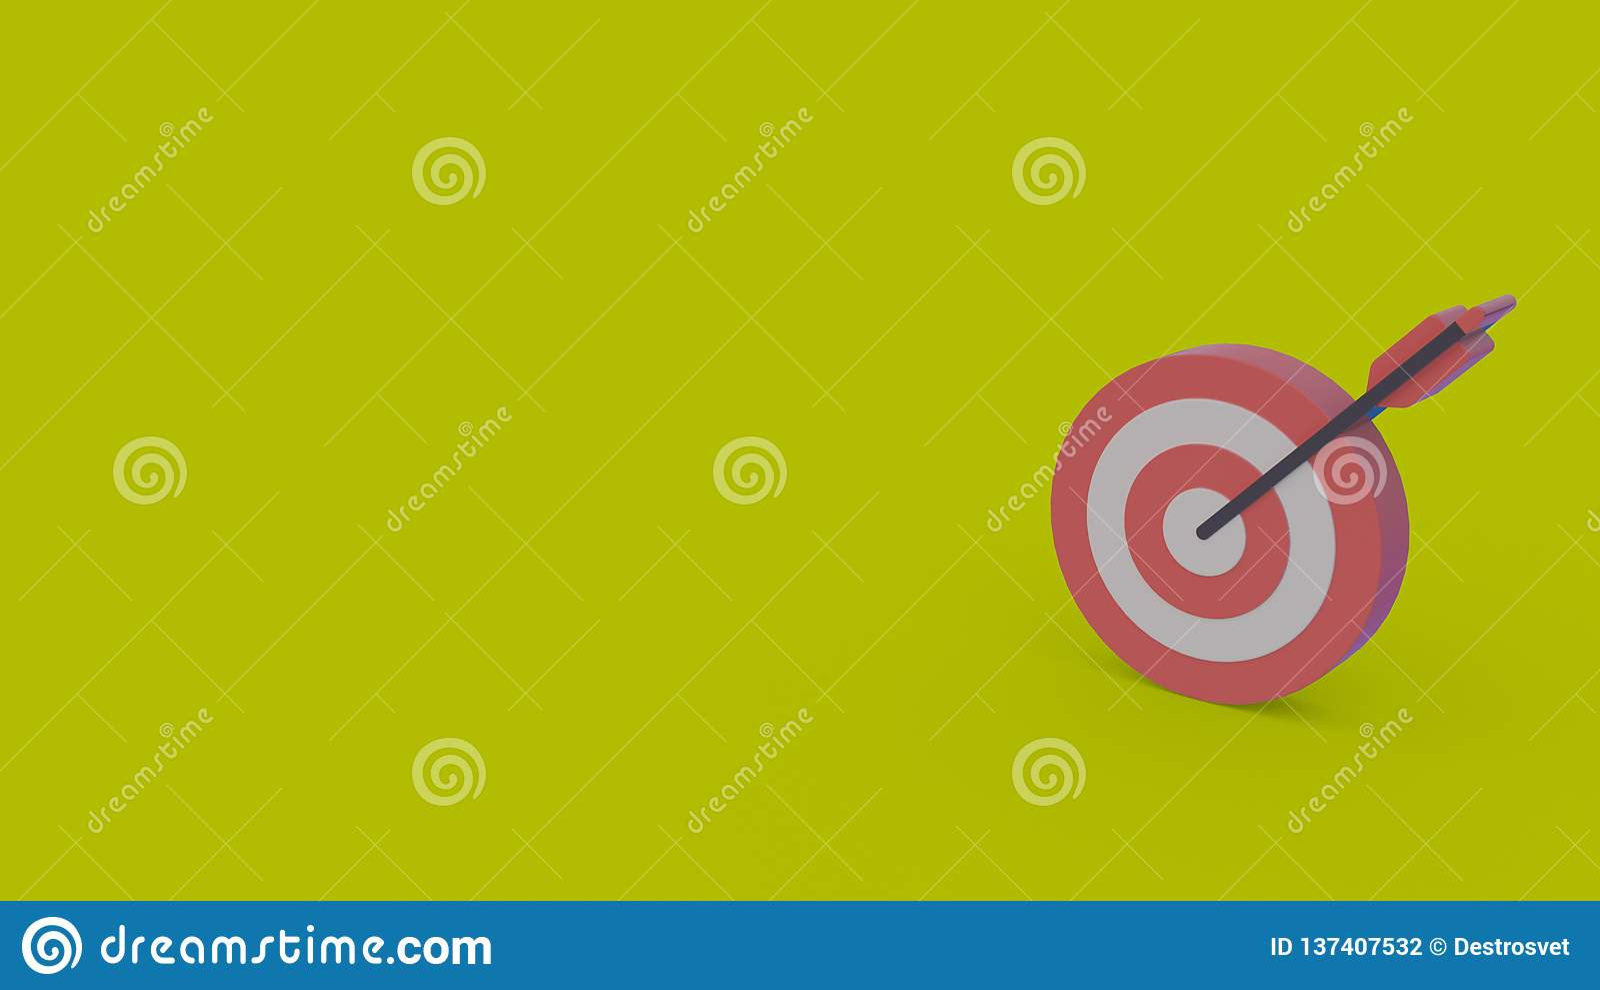 3d icon of dart board